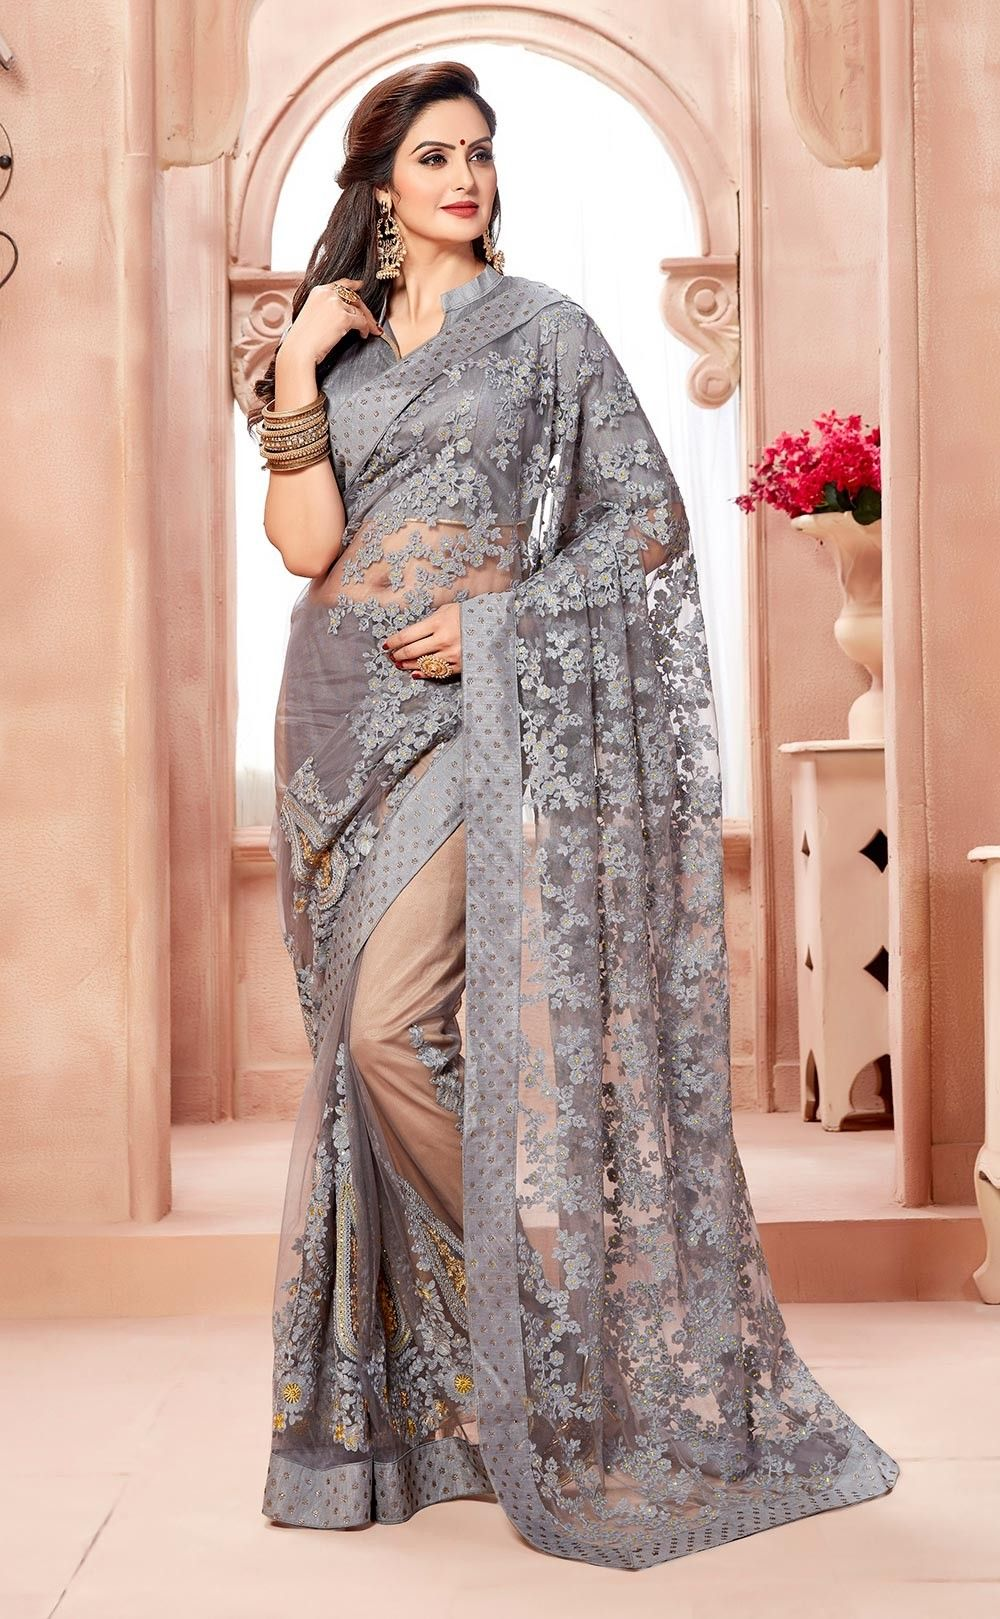 da696b11a Grey Saree, Net Saree, ₹3,900.00. Buy latest Saree with custom stitching  and worldwide shipping.